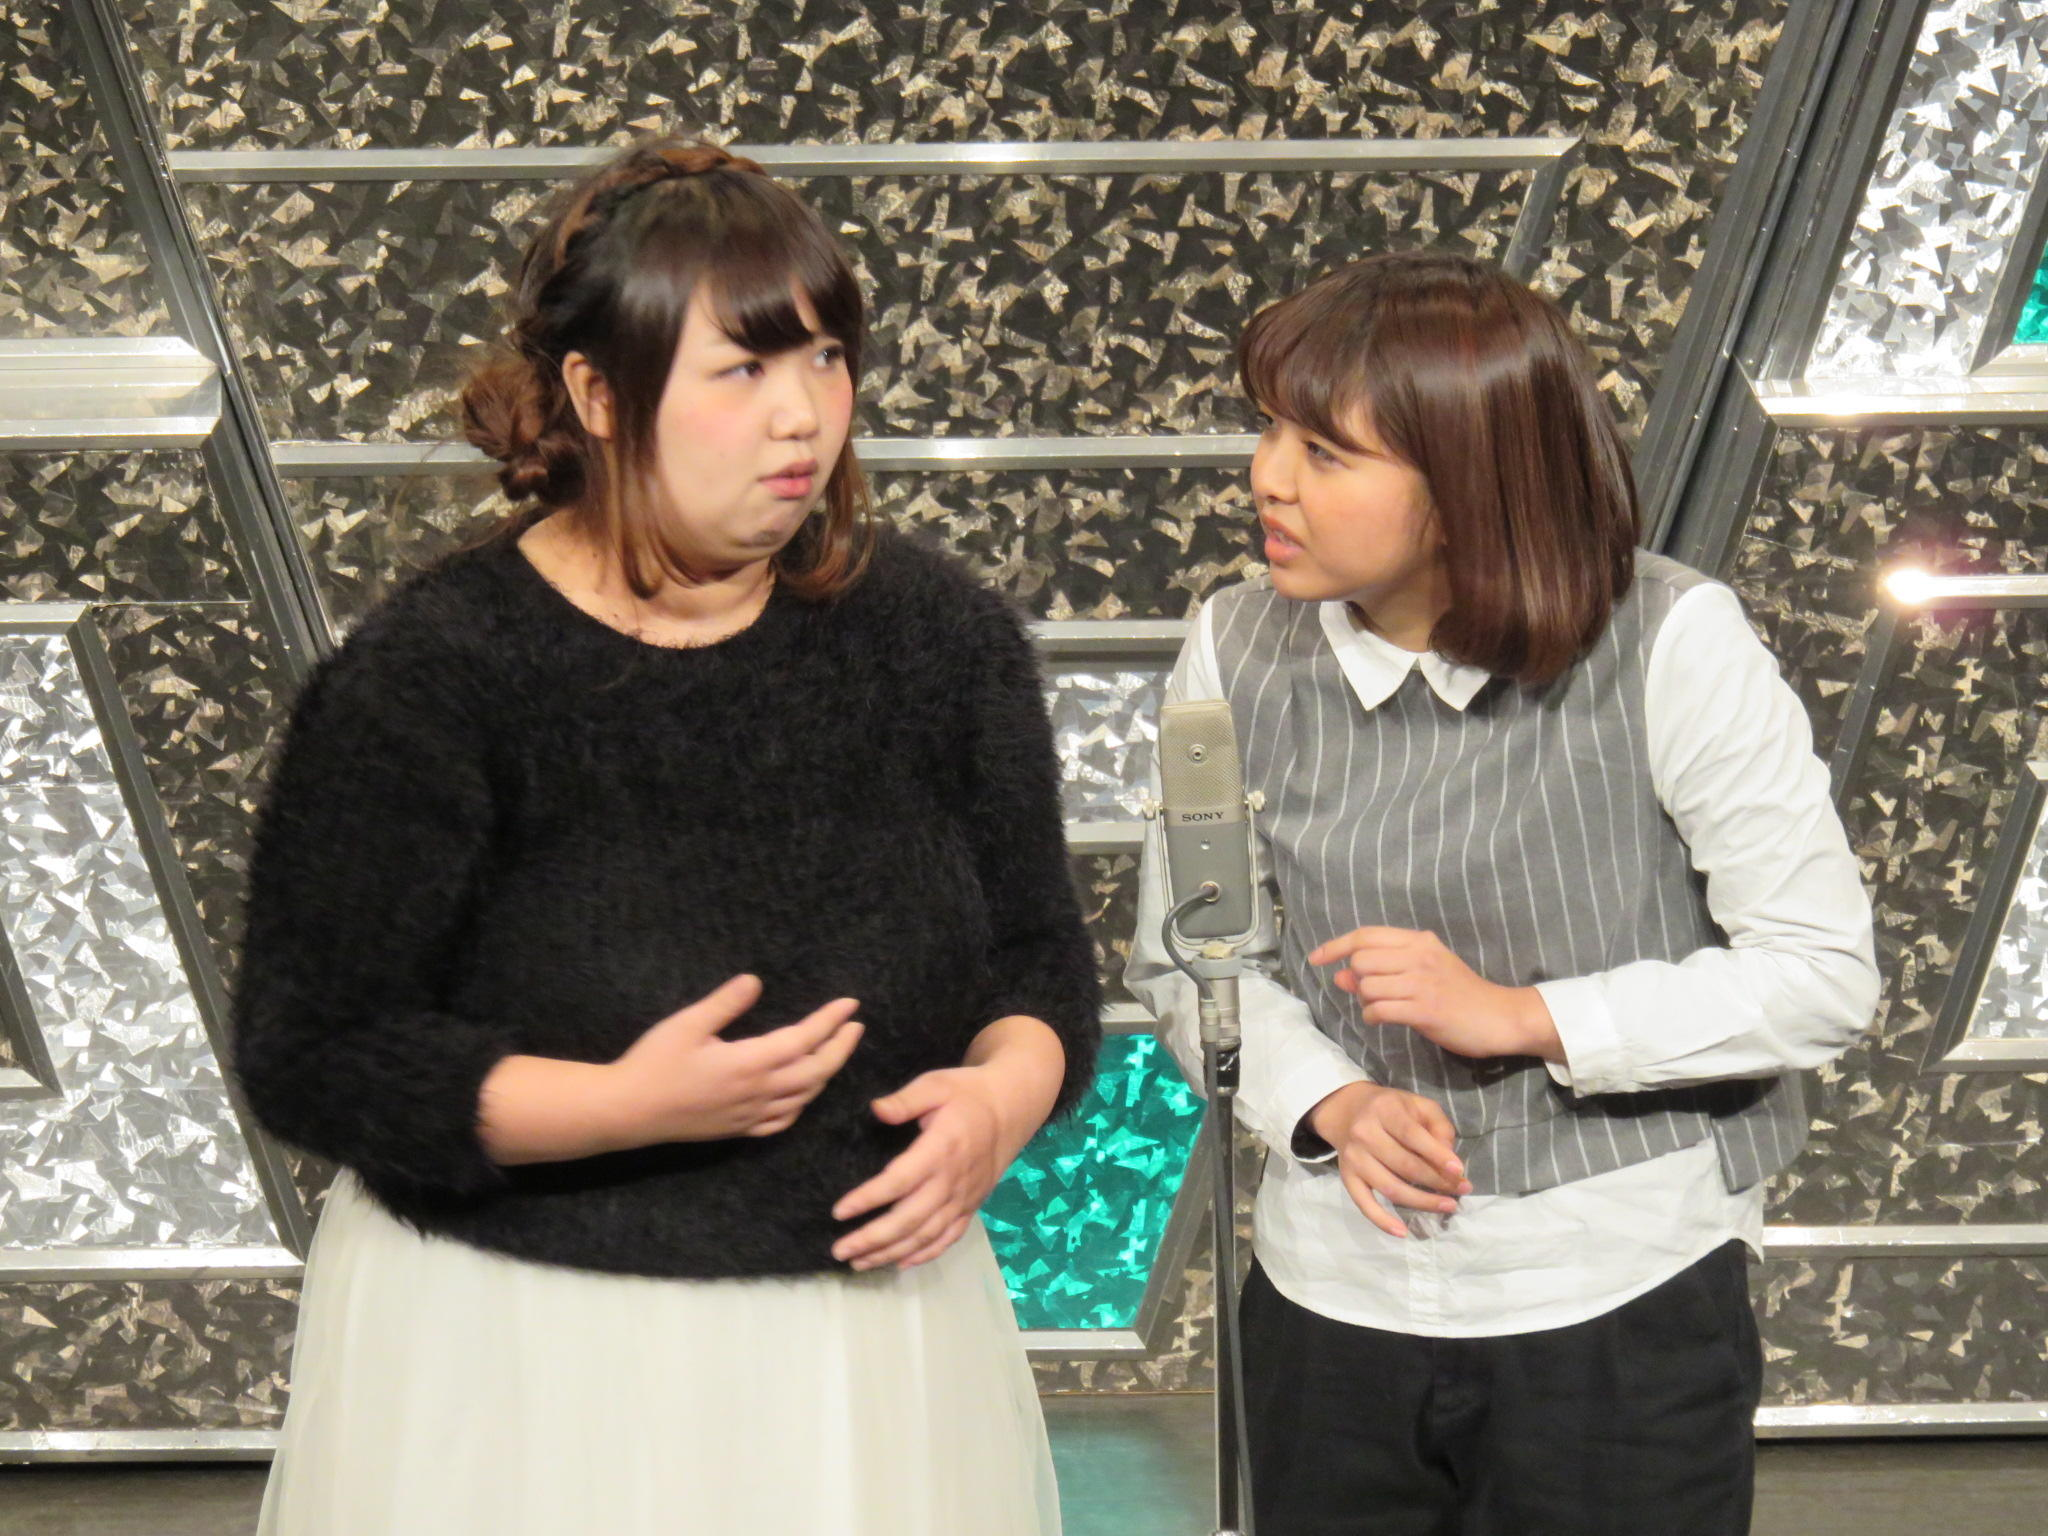 http://news.yoshimoto.co.jp/20151130224922-4d52a03b9d304edbeab6c8a9242be24e5875ee77.jpg